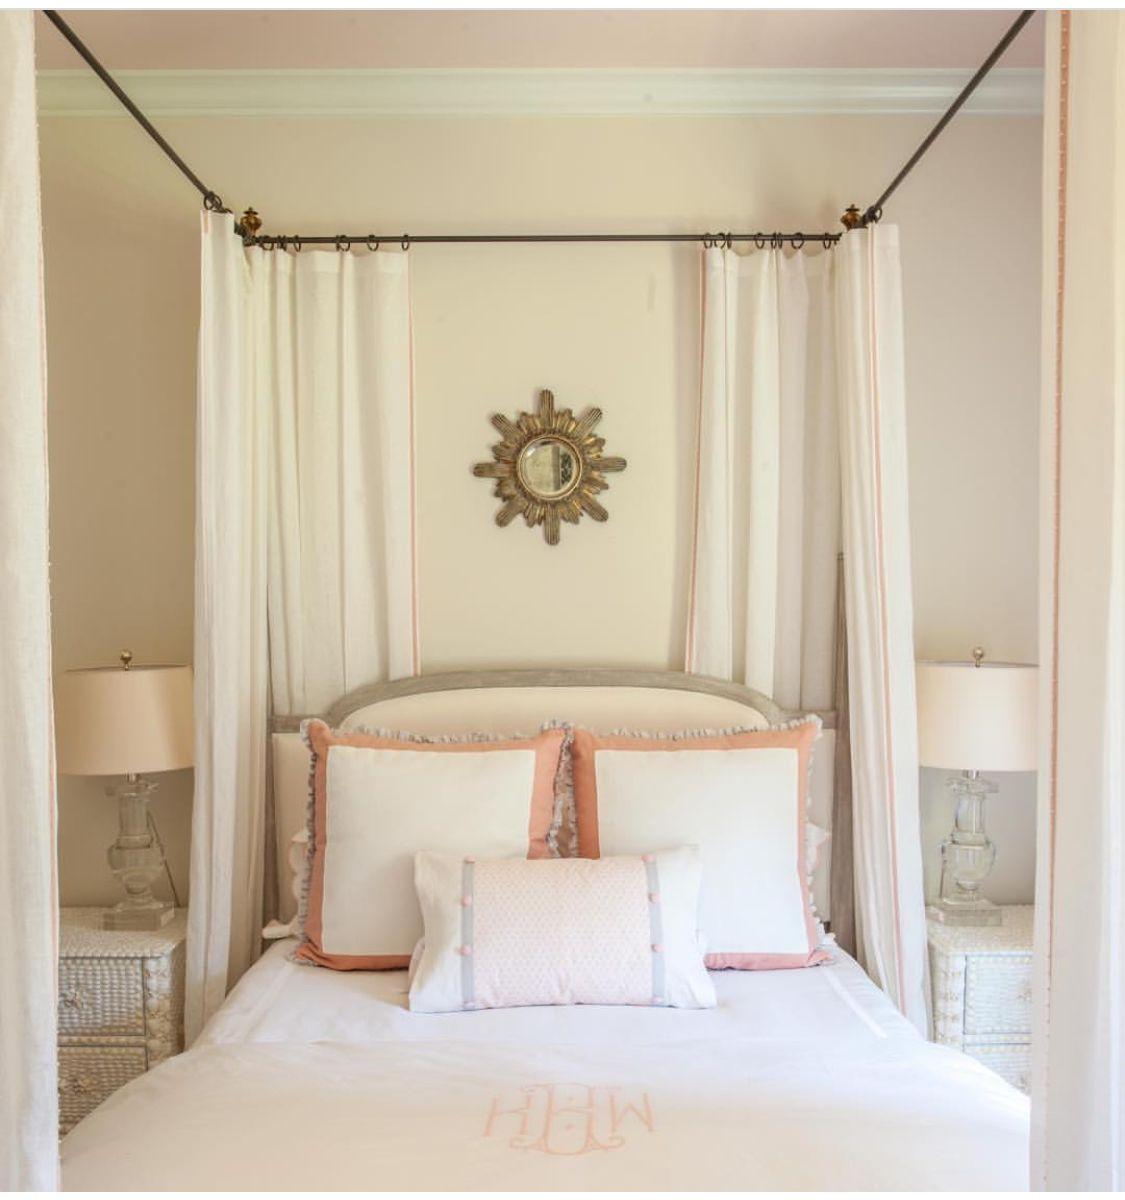 bedroom design inspiration bedroom interior design in 2019 rh pinterest com